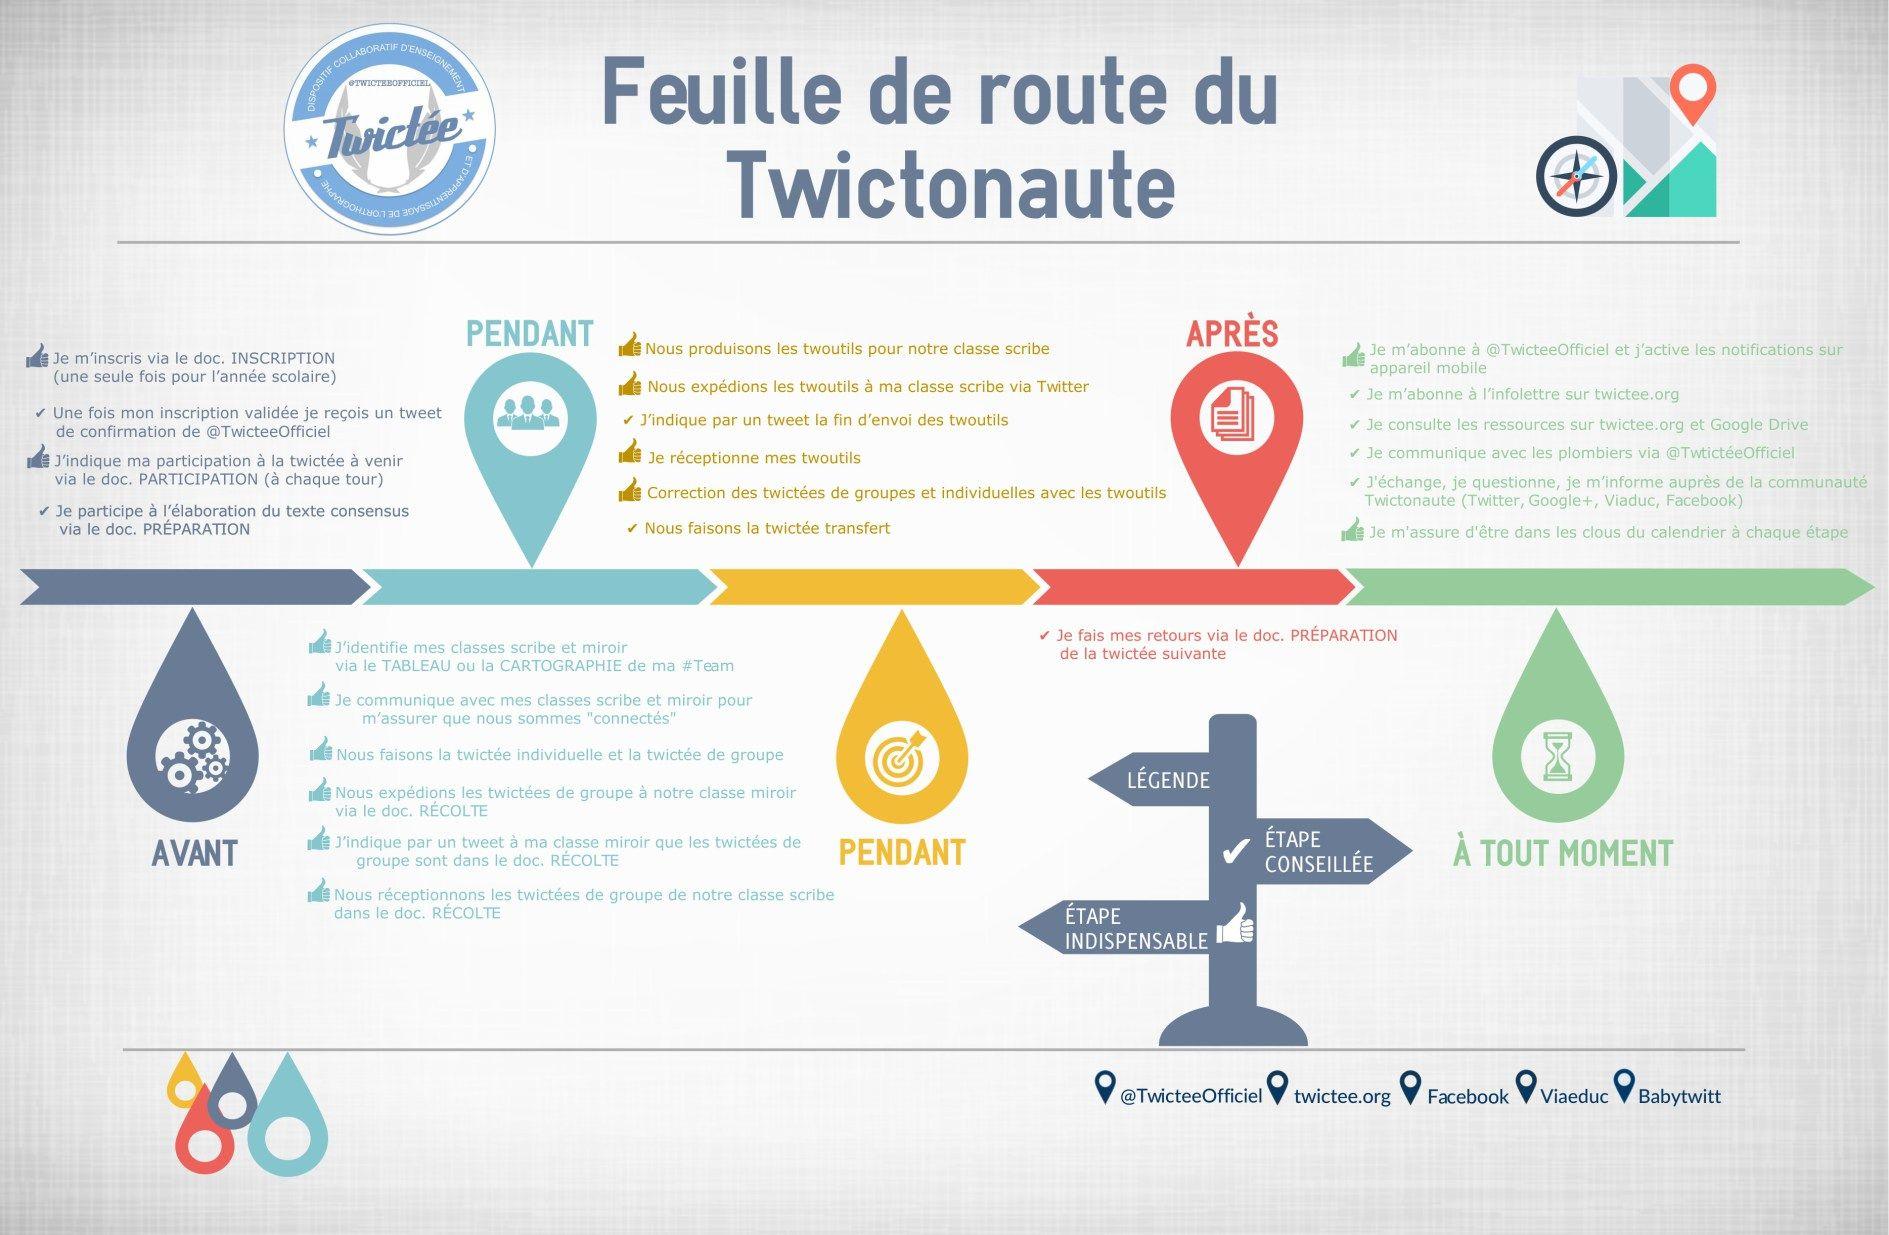 feuille-de-route-twictonaute